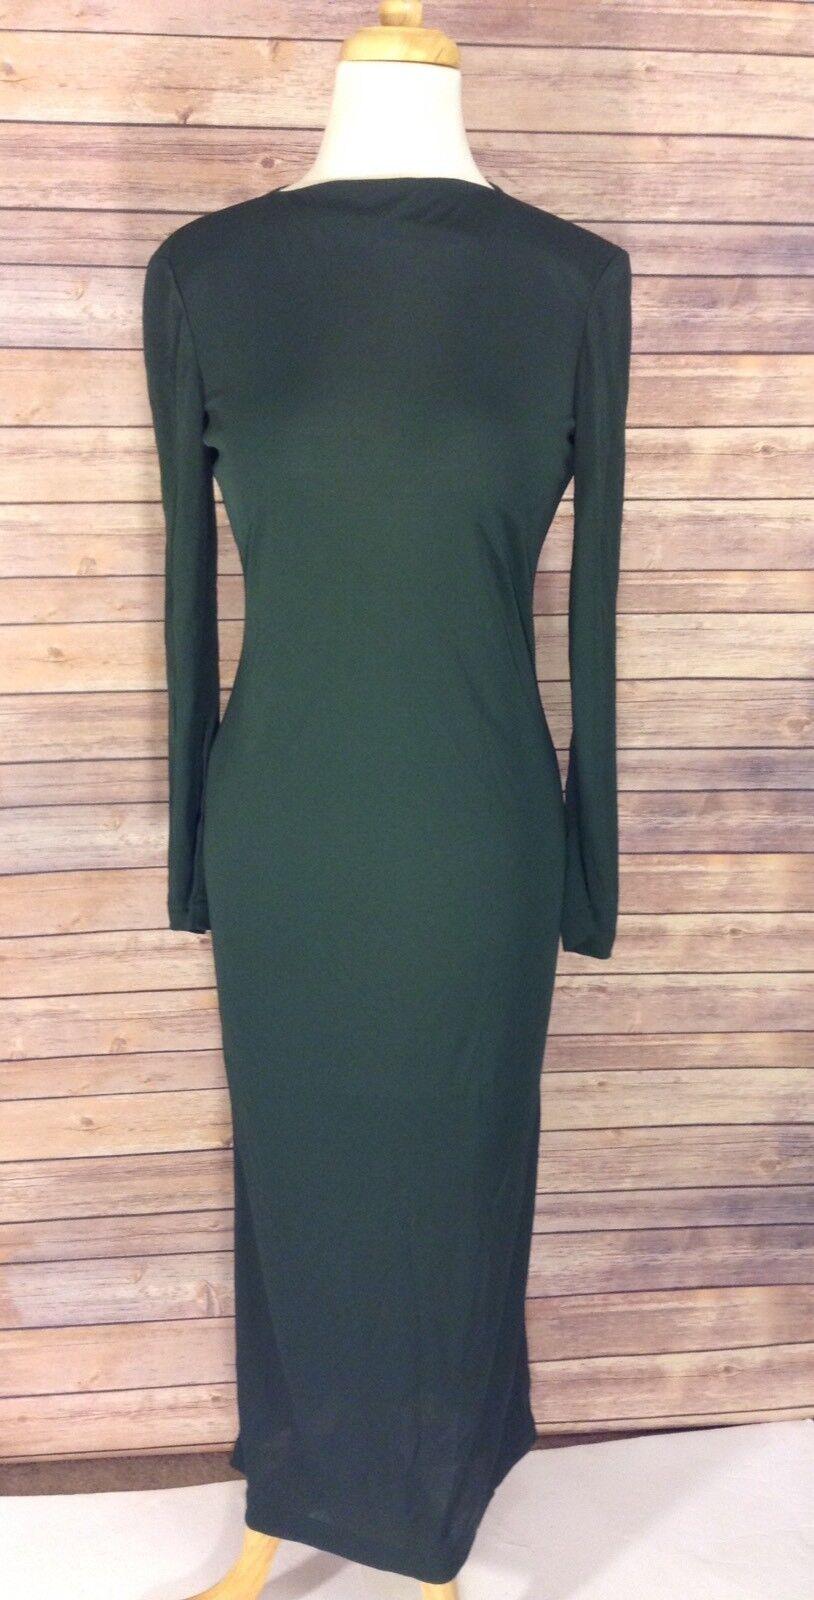 Joan Joan Joan and David Green Vintage Long Sleeve Sheer Dress Size 8 a879ae